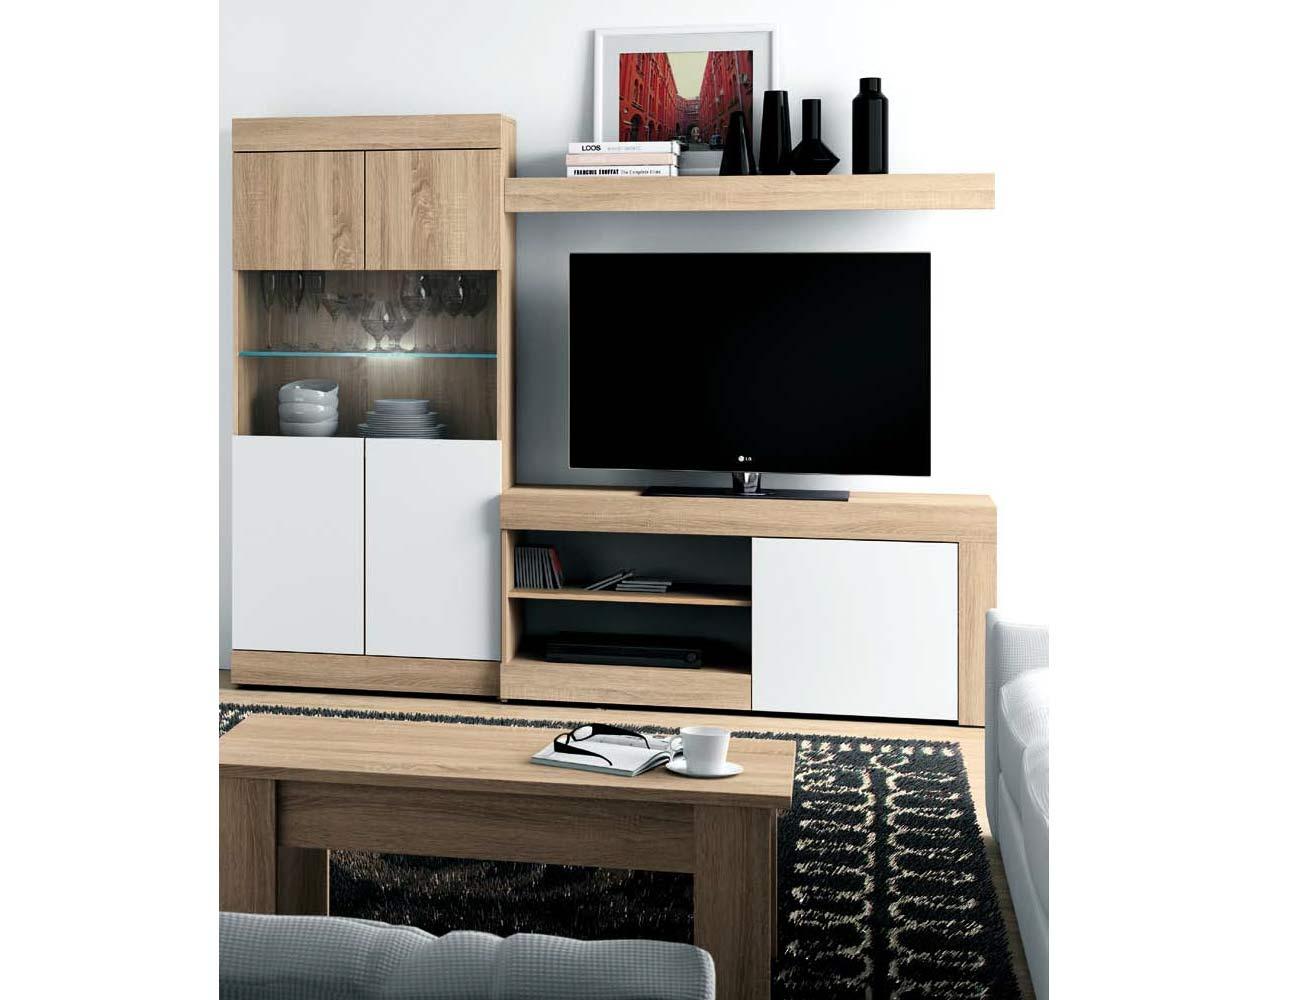 Mueble salon moderno leds cambrian blanco ambiente 22